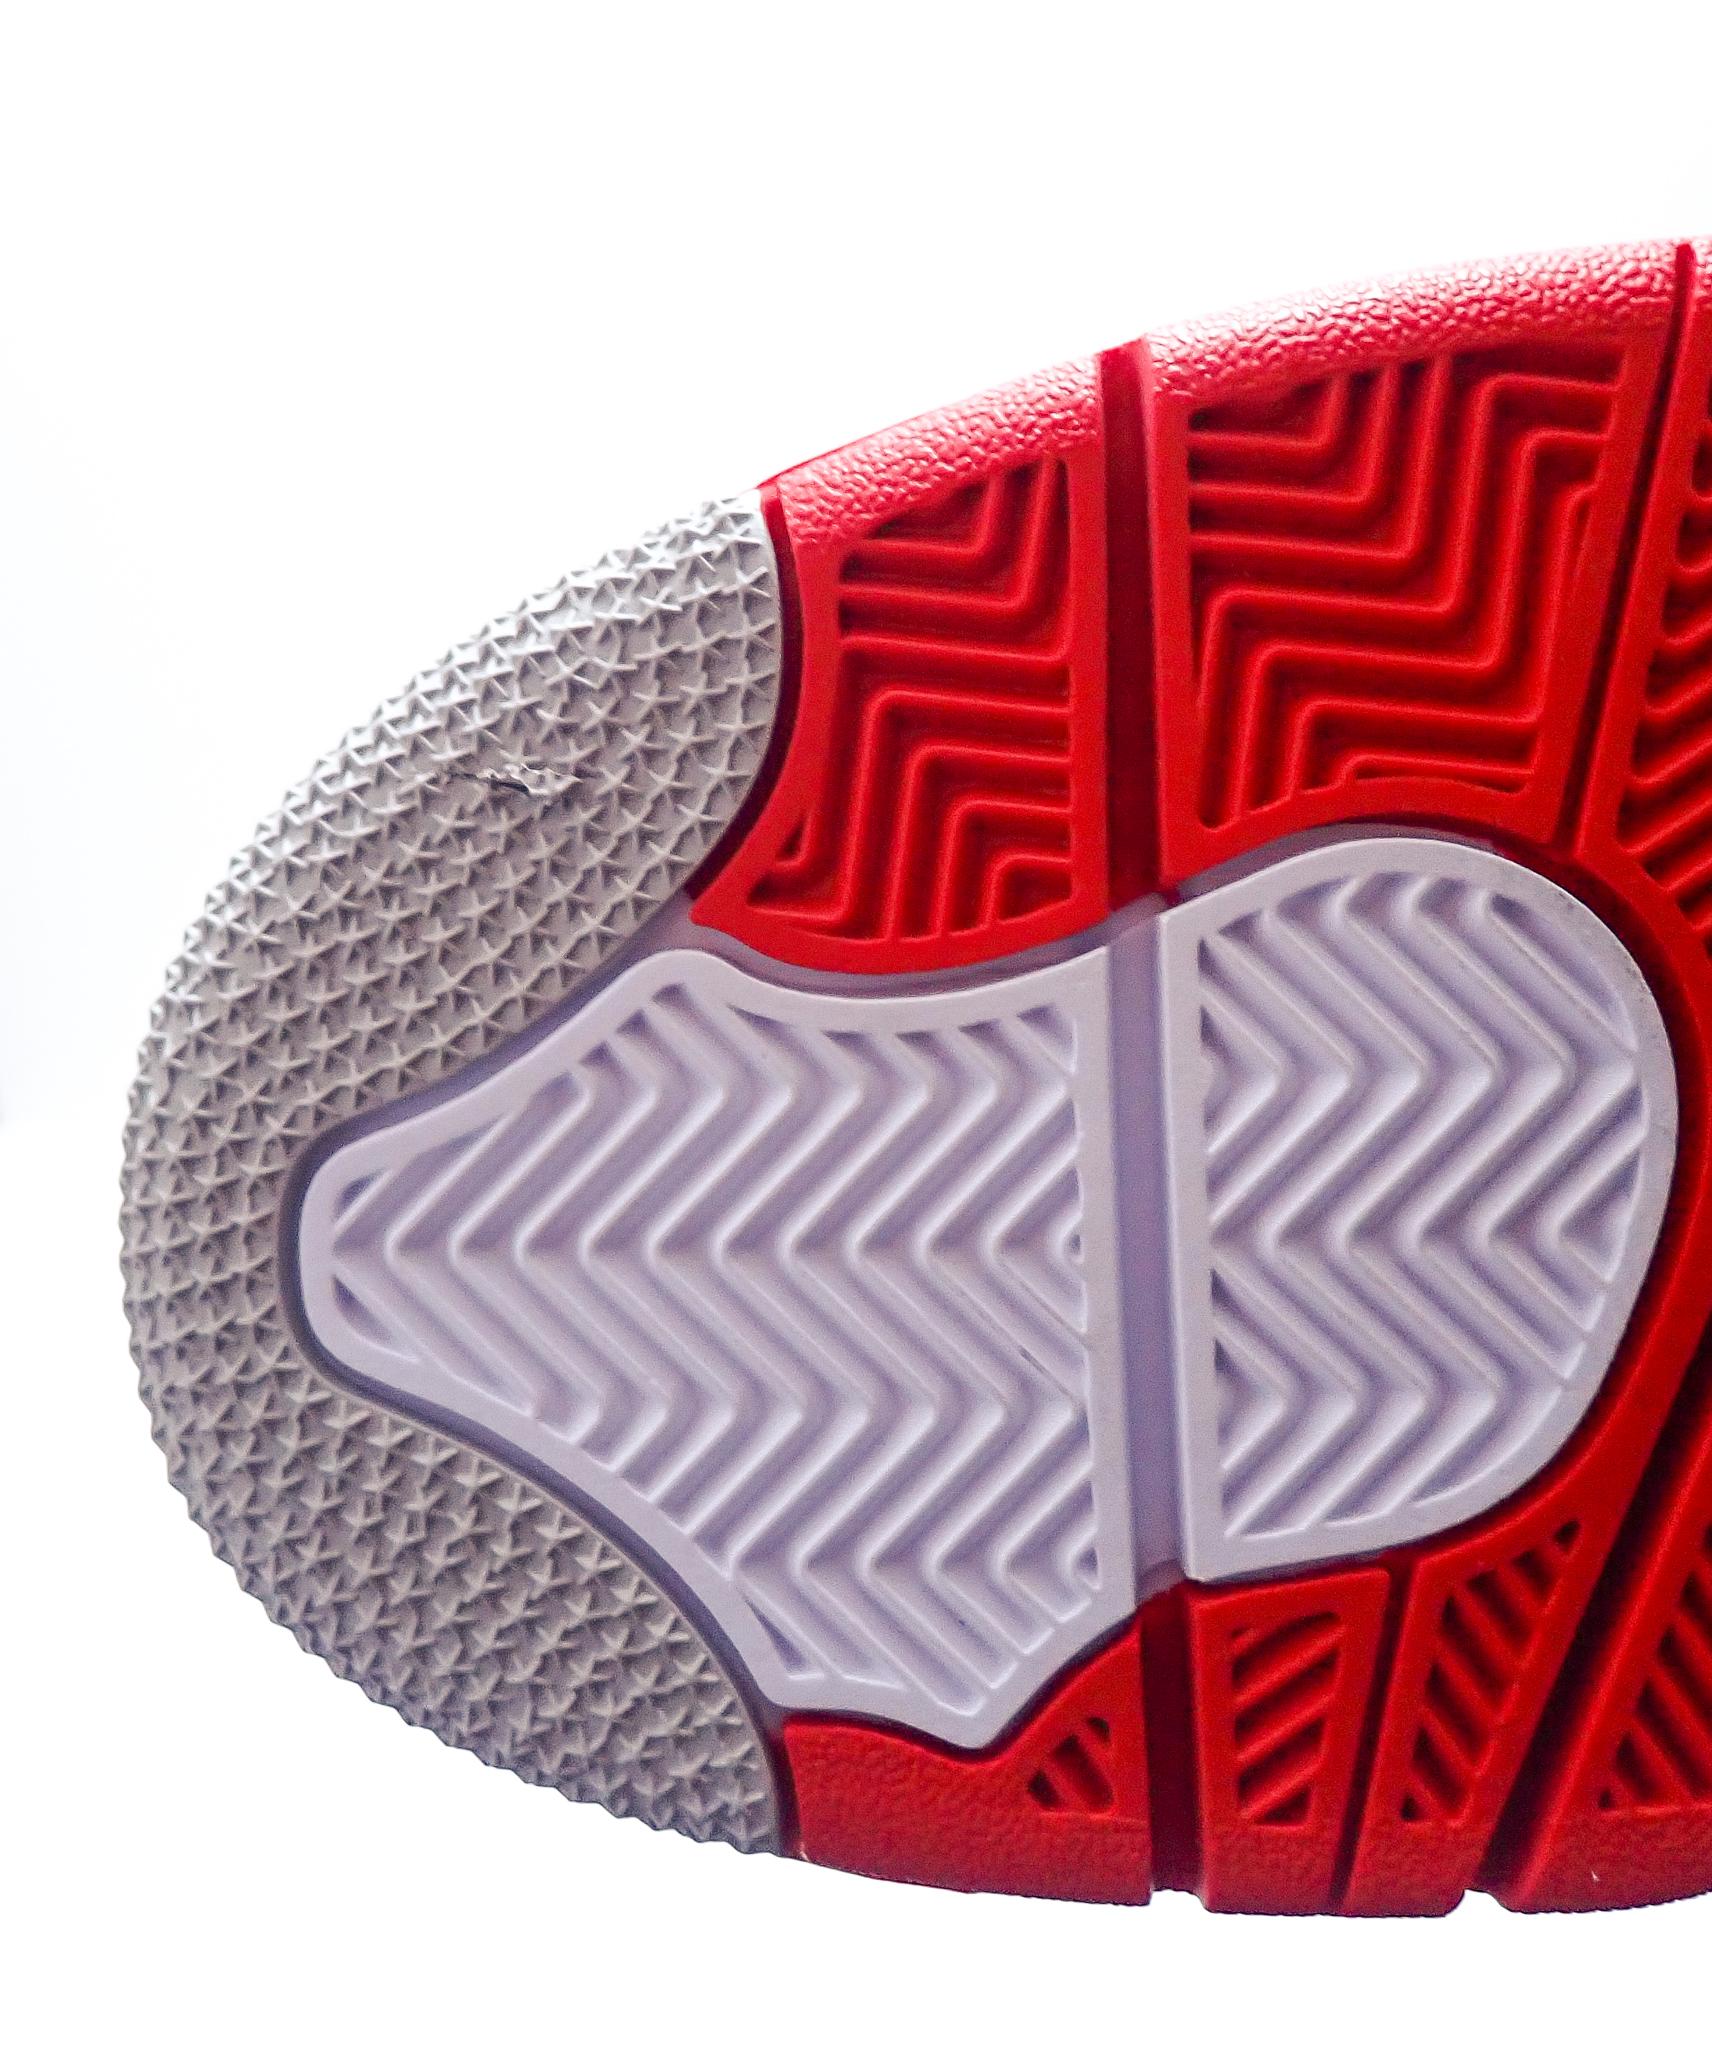 Jordan 4 Retro Fire Red (2020)